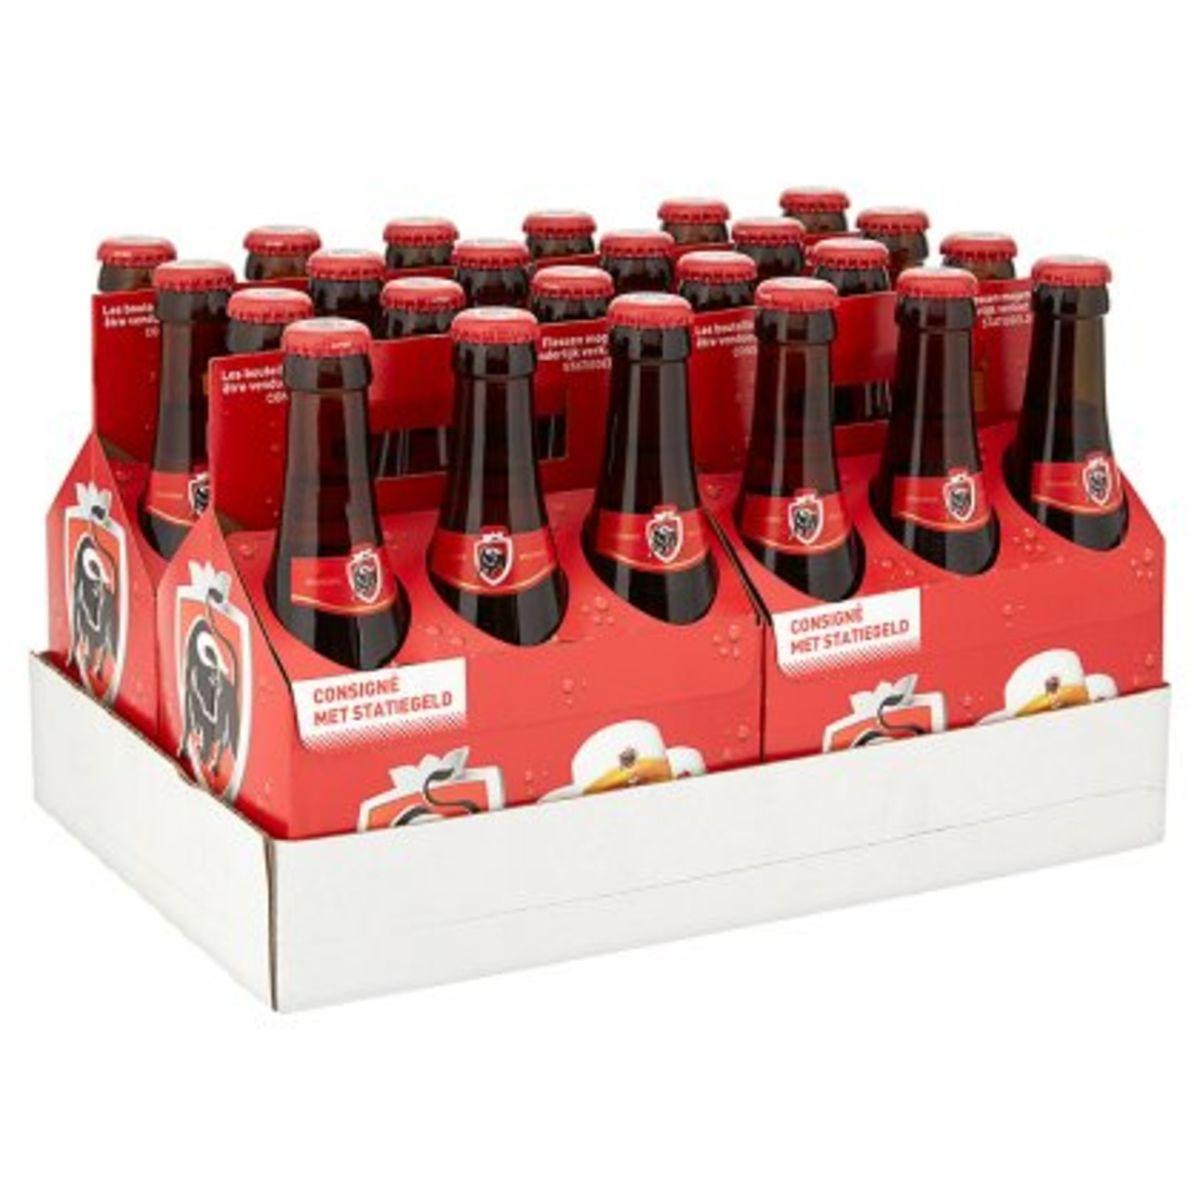 Jupiler Blond bier 24 x 25 cl